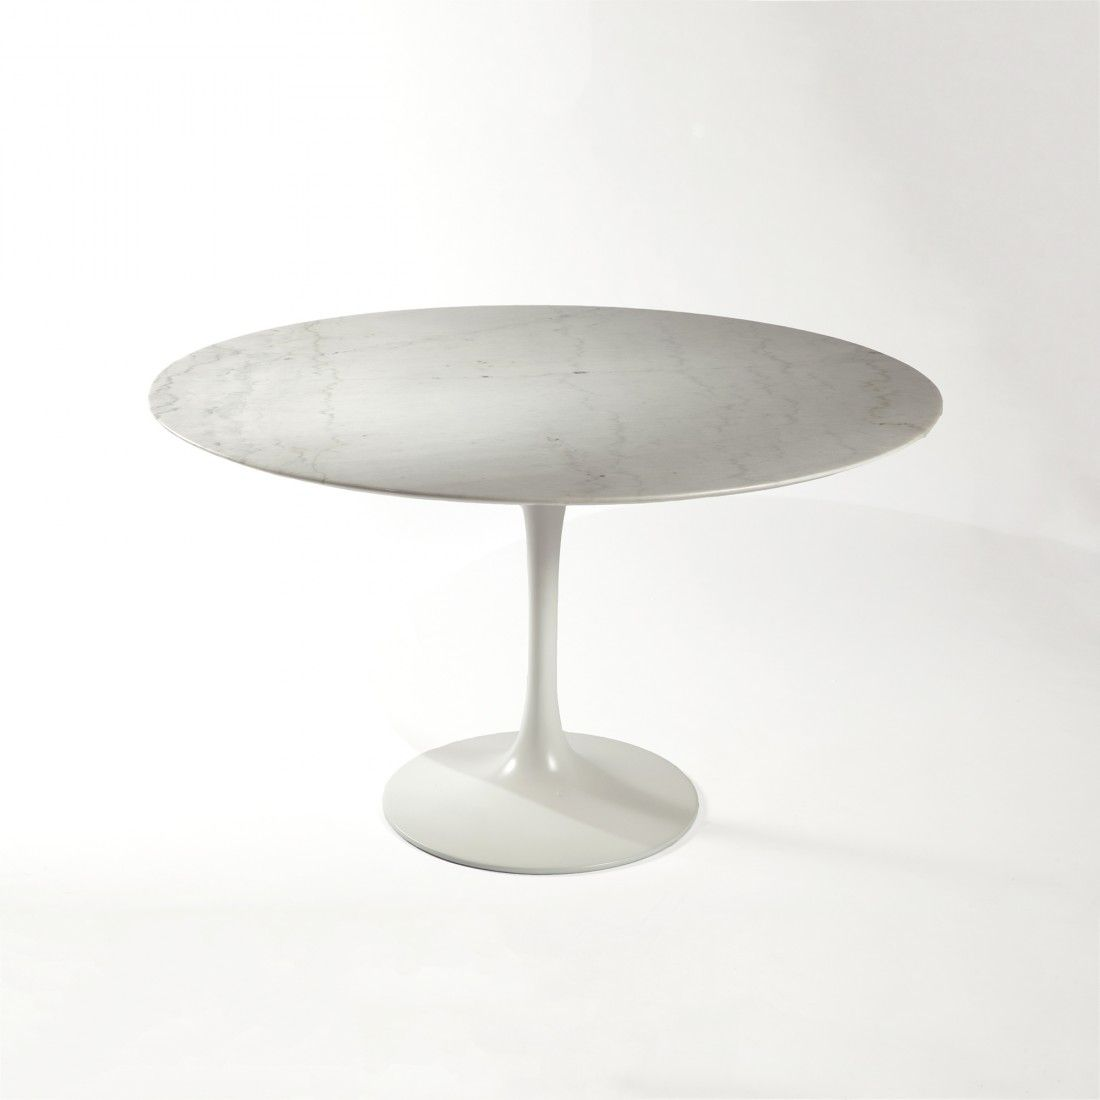 Tulip Dining Table 48 High Grade Marble Mid Century Modern  # Muebles Eero Saarinen